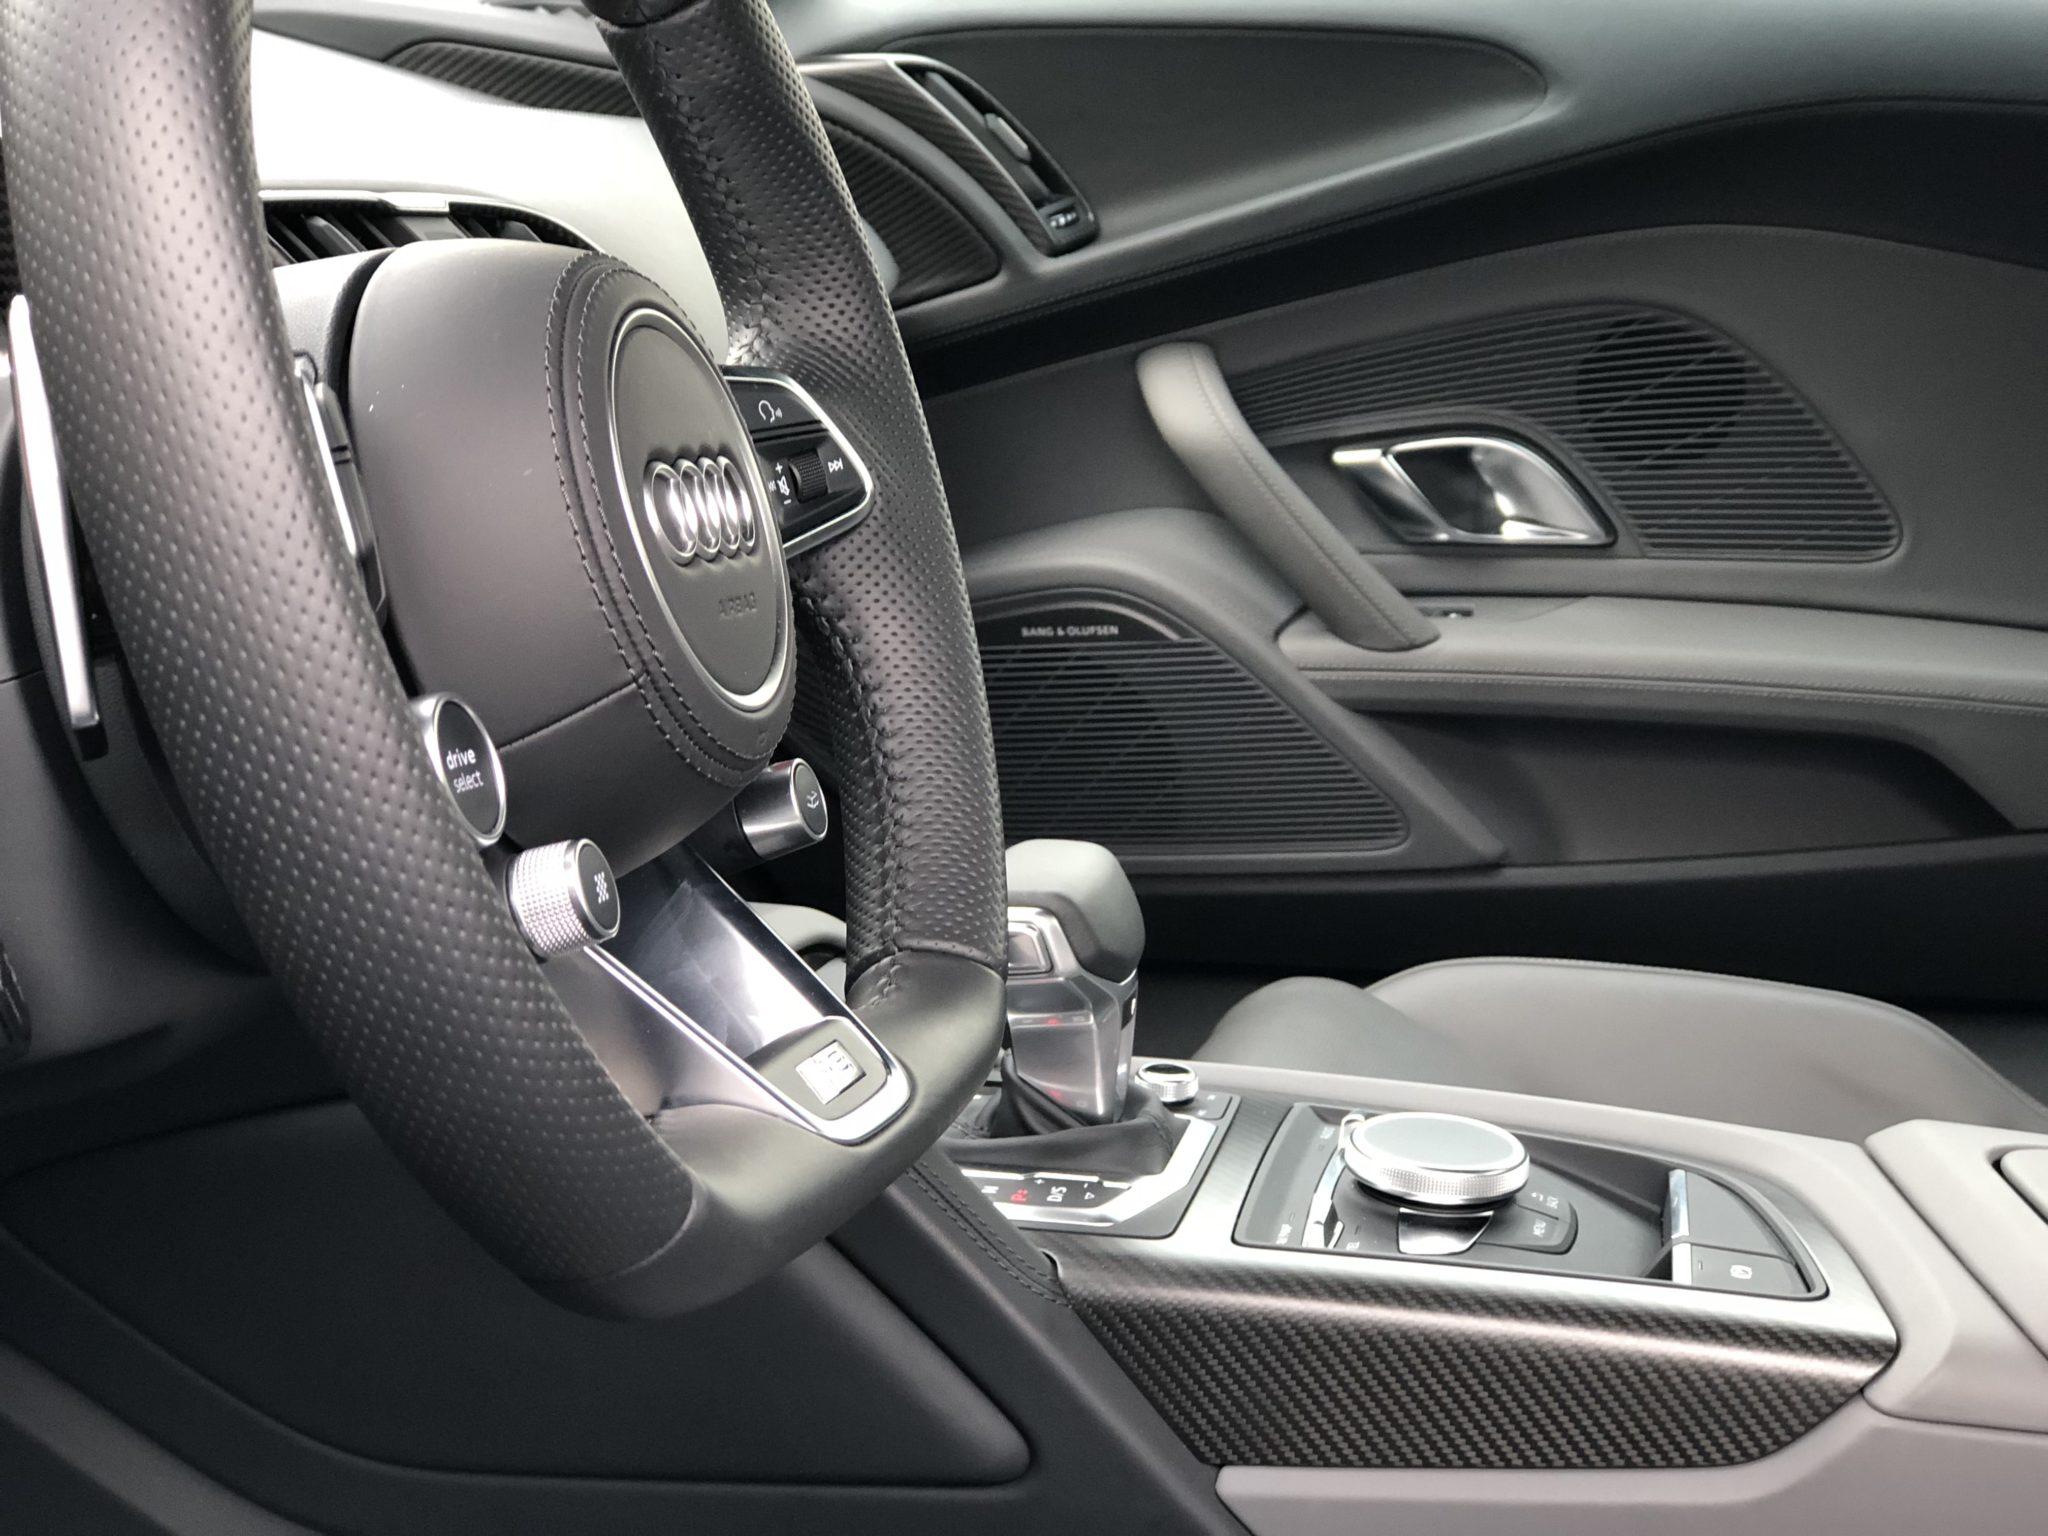 Audi R8 V10 Plus Innenansicht